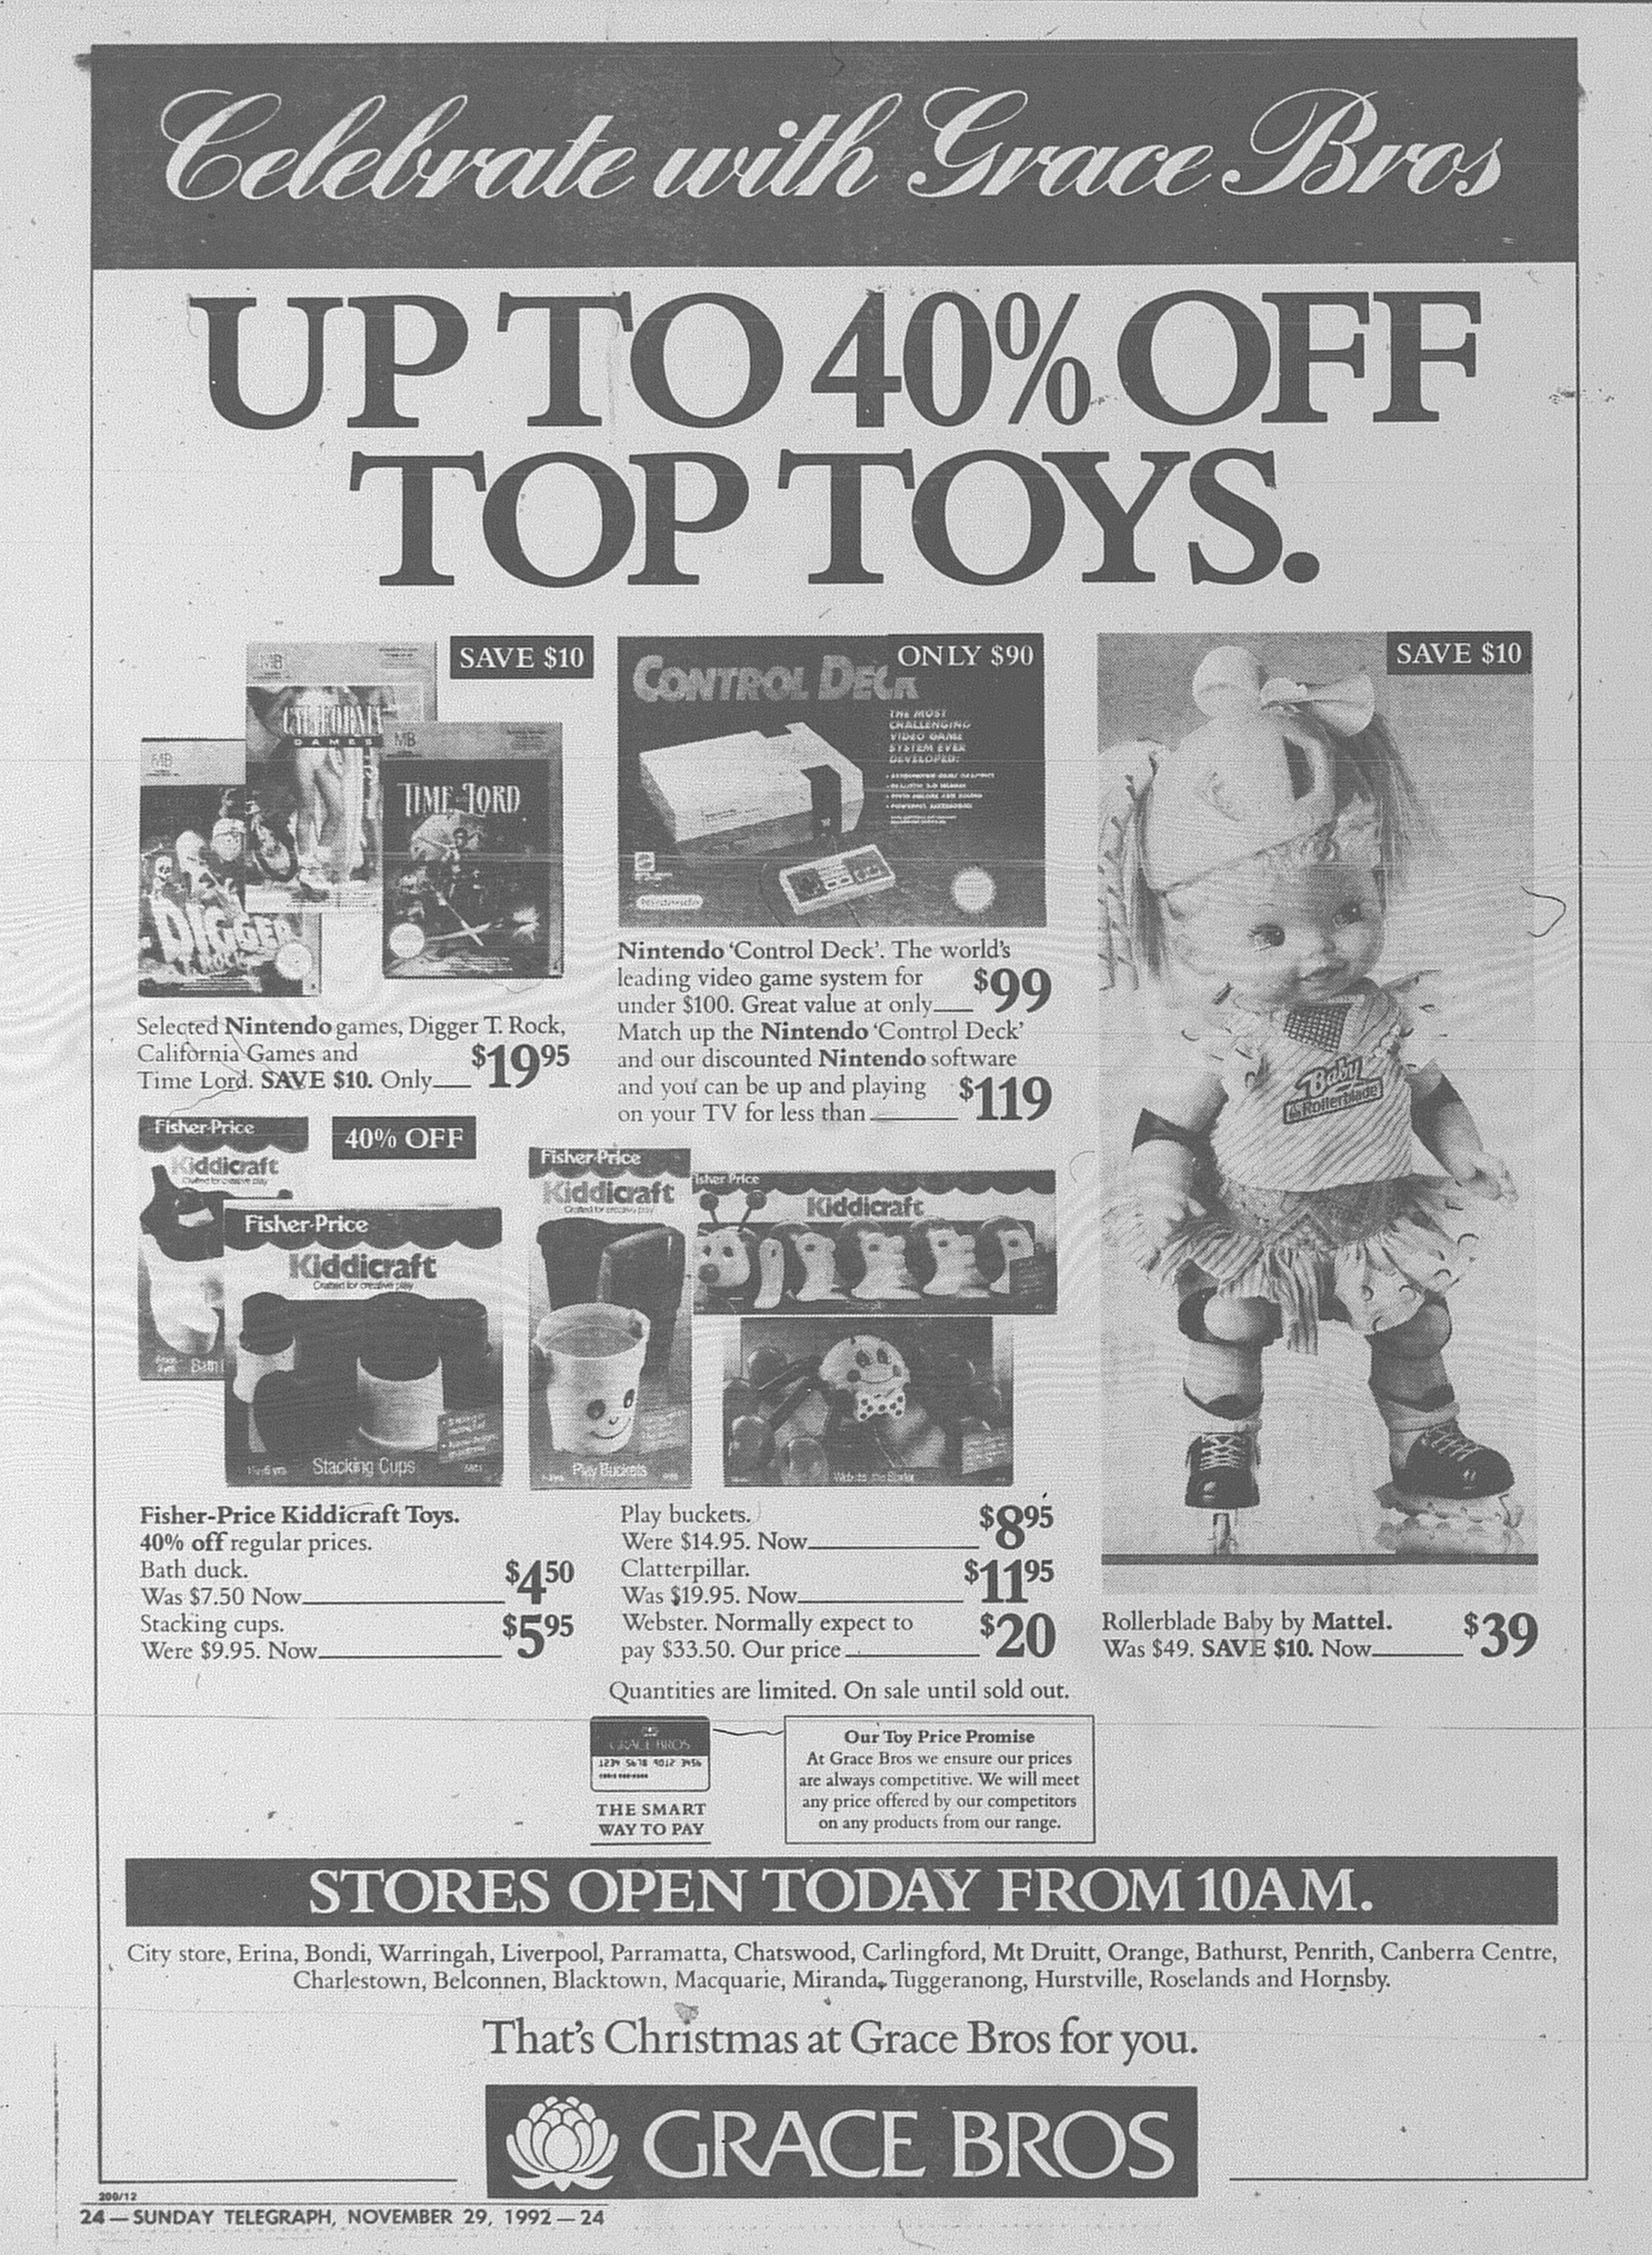 Grace Bros Ad November 29 1992 sunday telegraph